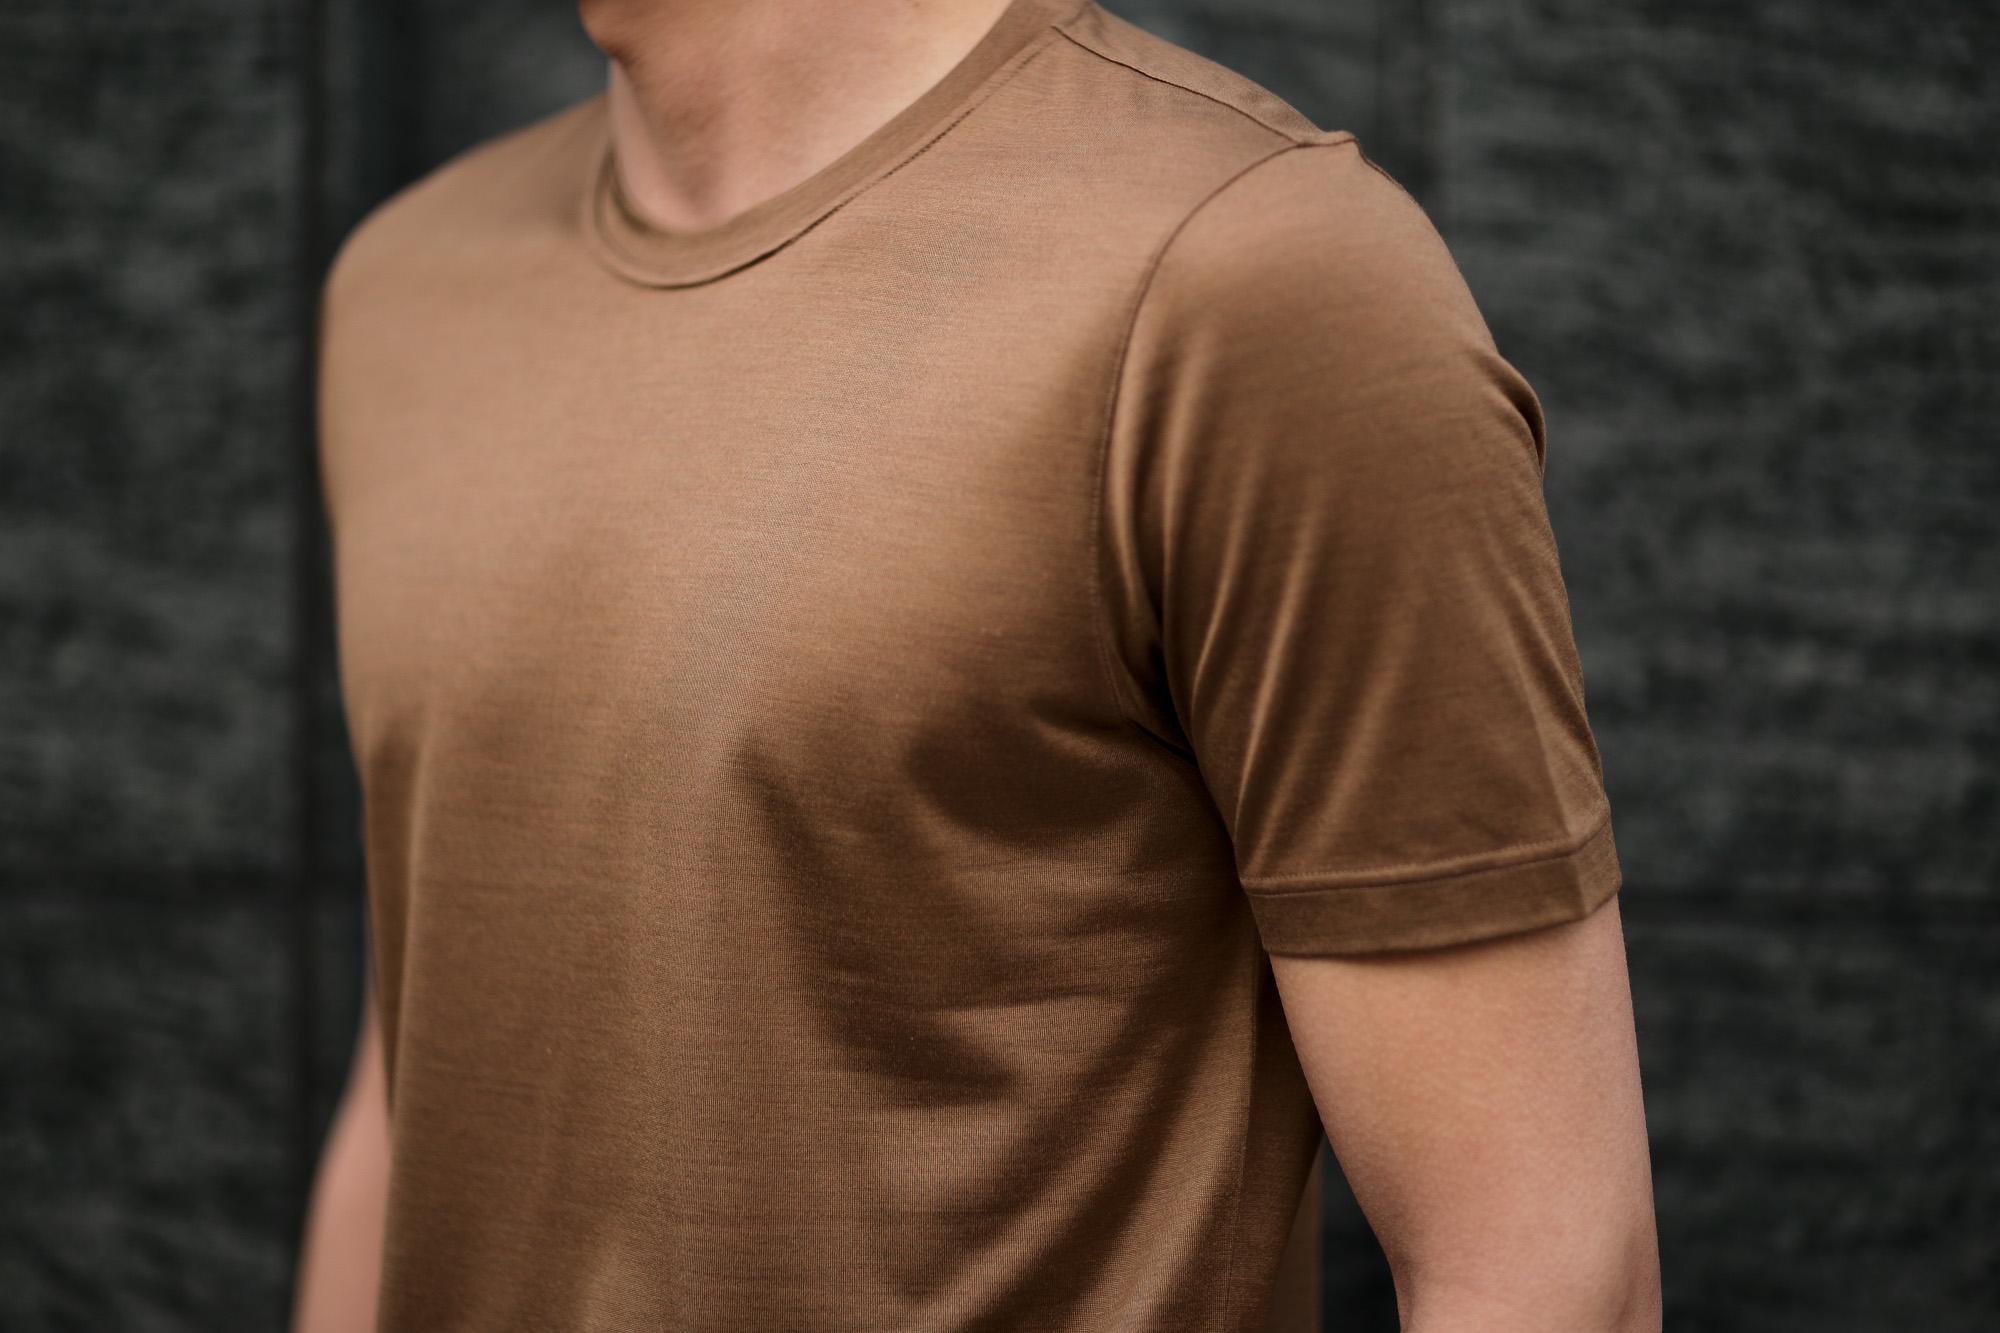 Gran Sasso (グランサッソ) Silk T-shirt (シルク Tシャツ) SETA (シルク 100%) ショートスリーブ シルク Tシャツ GOLD (ゴールド・160) made in italy (イタリア製) 2020 春夏新作  愛知 名古屋 altoediritto アルトエデリット